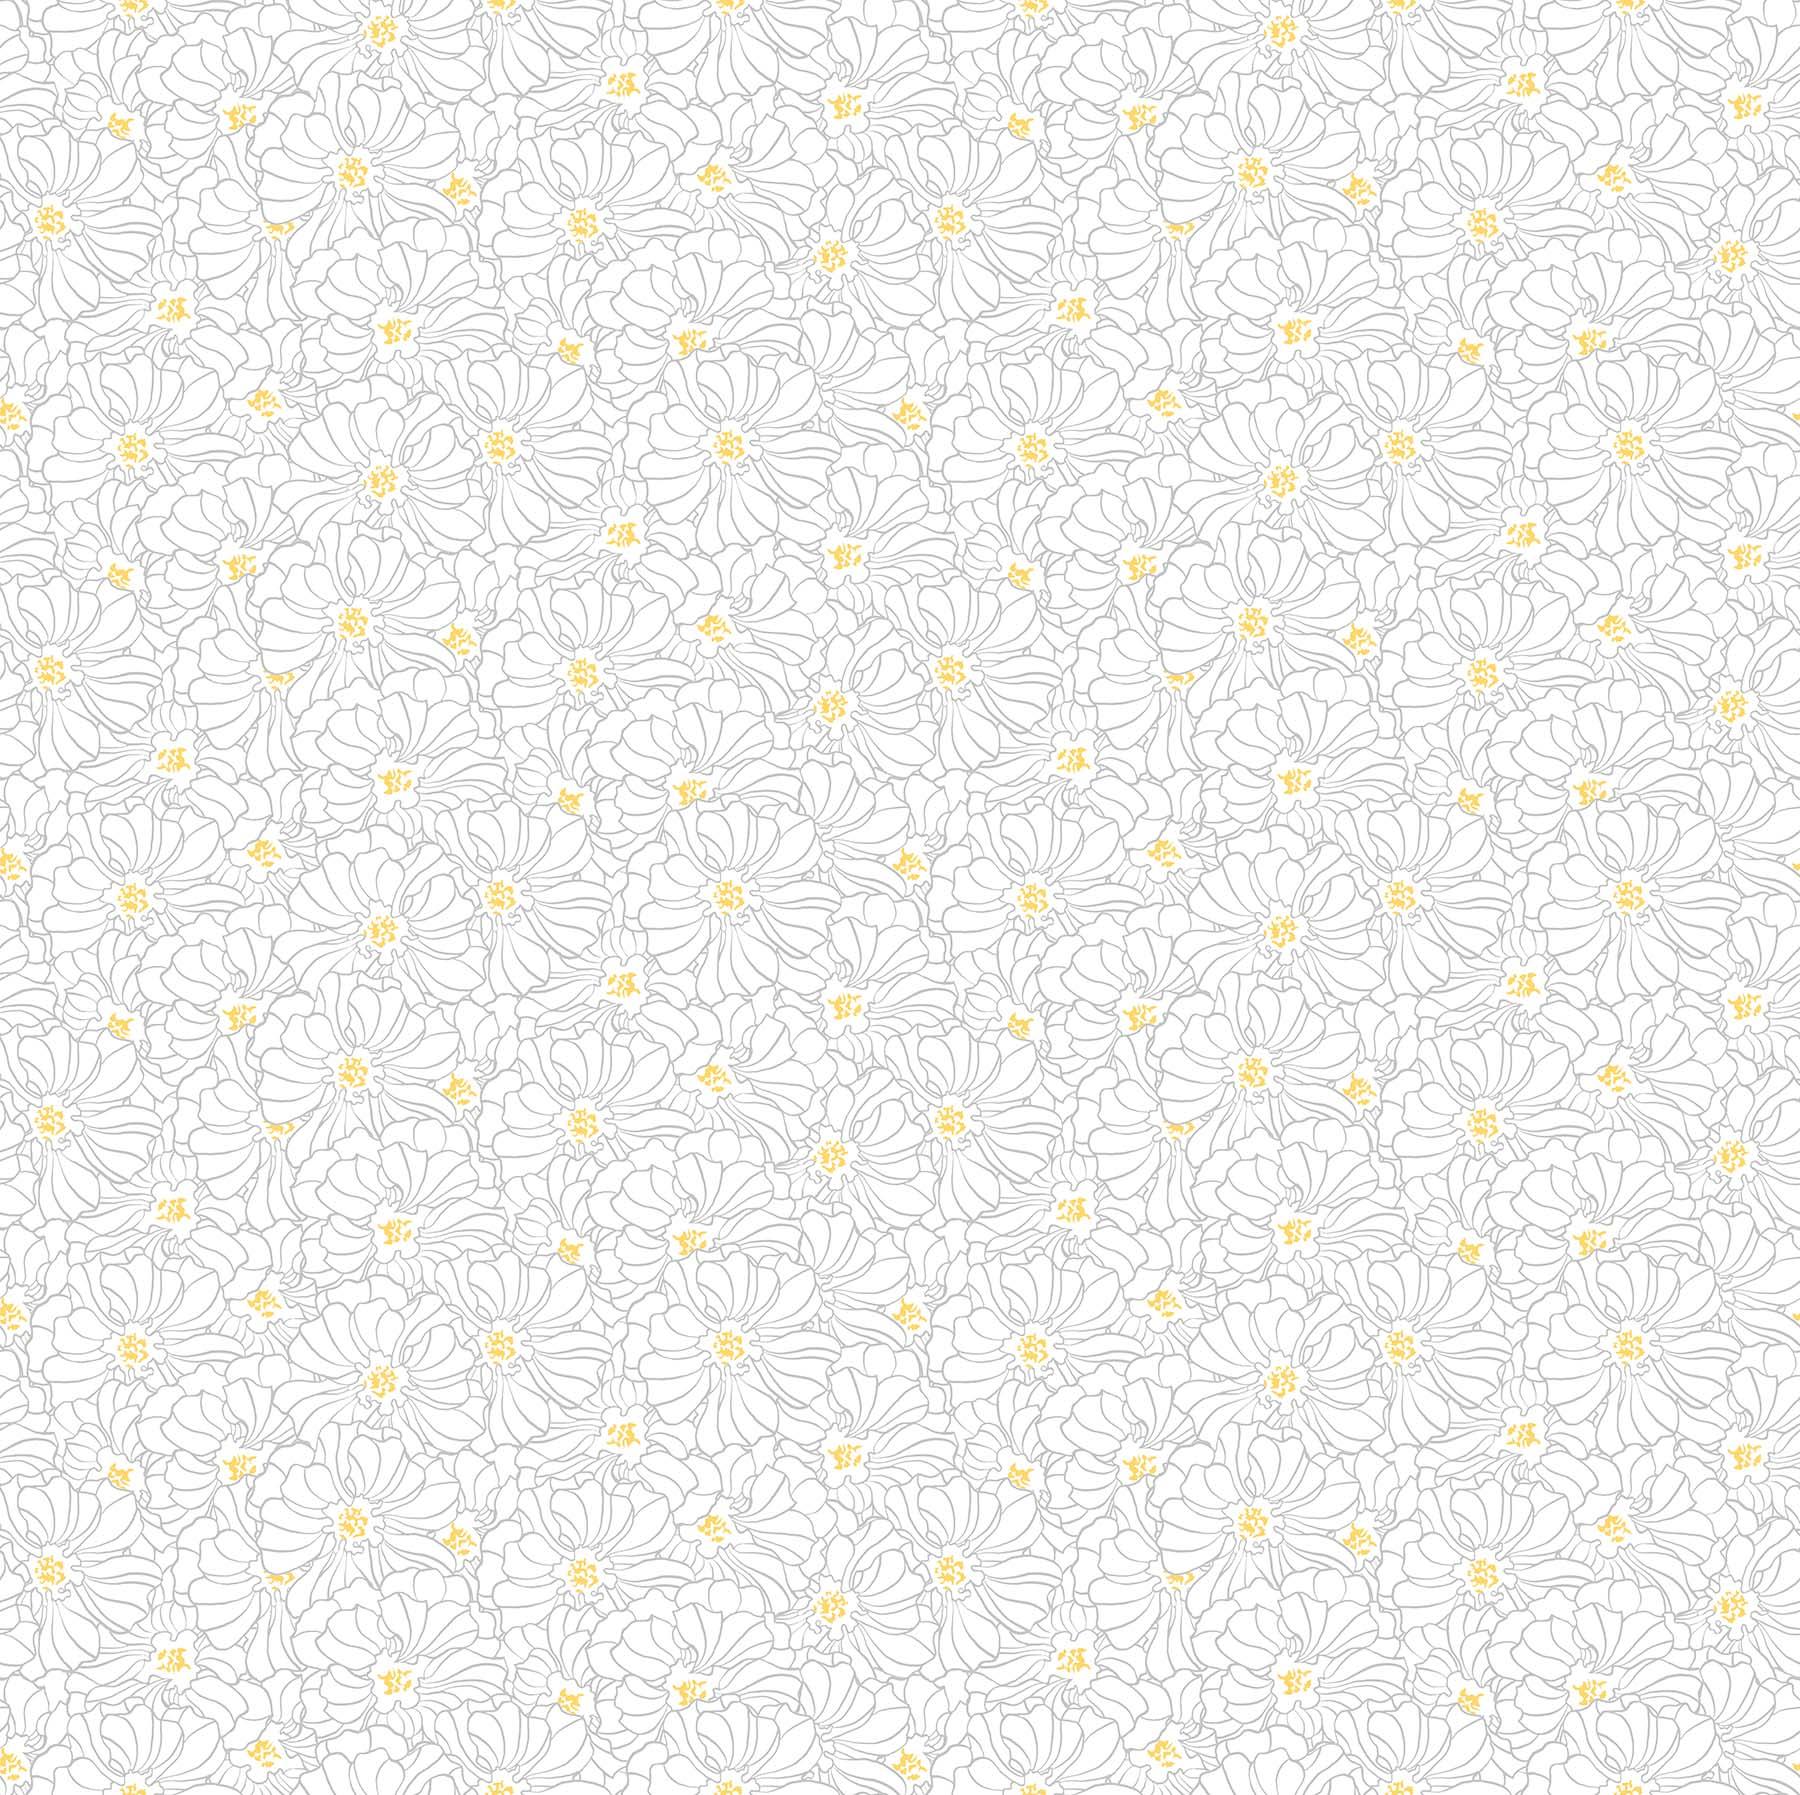 WINDSONG WHITE GRAY 23983-10